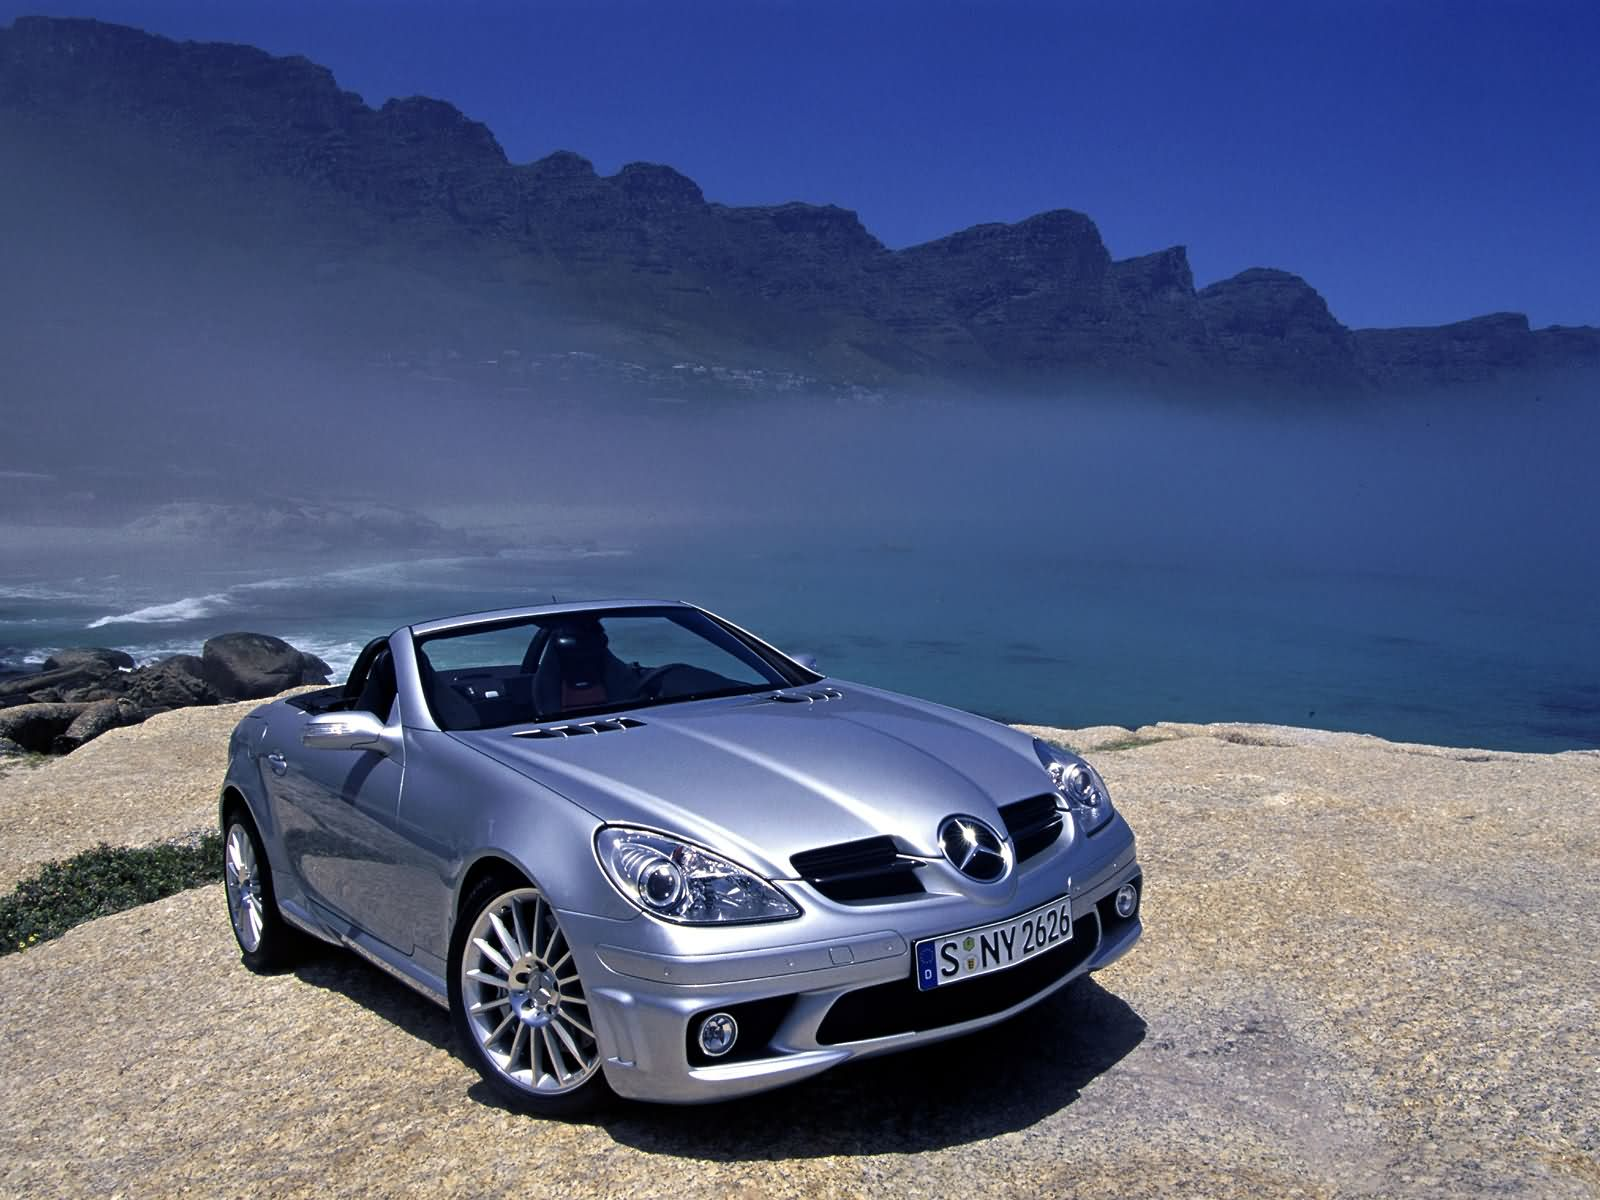 Mercedes-Benz_SLK55_AMG_2005_013.jpg